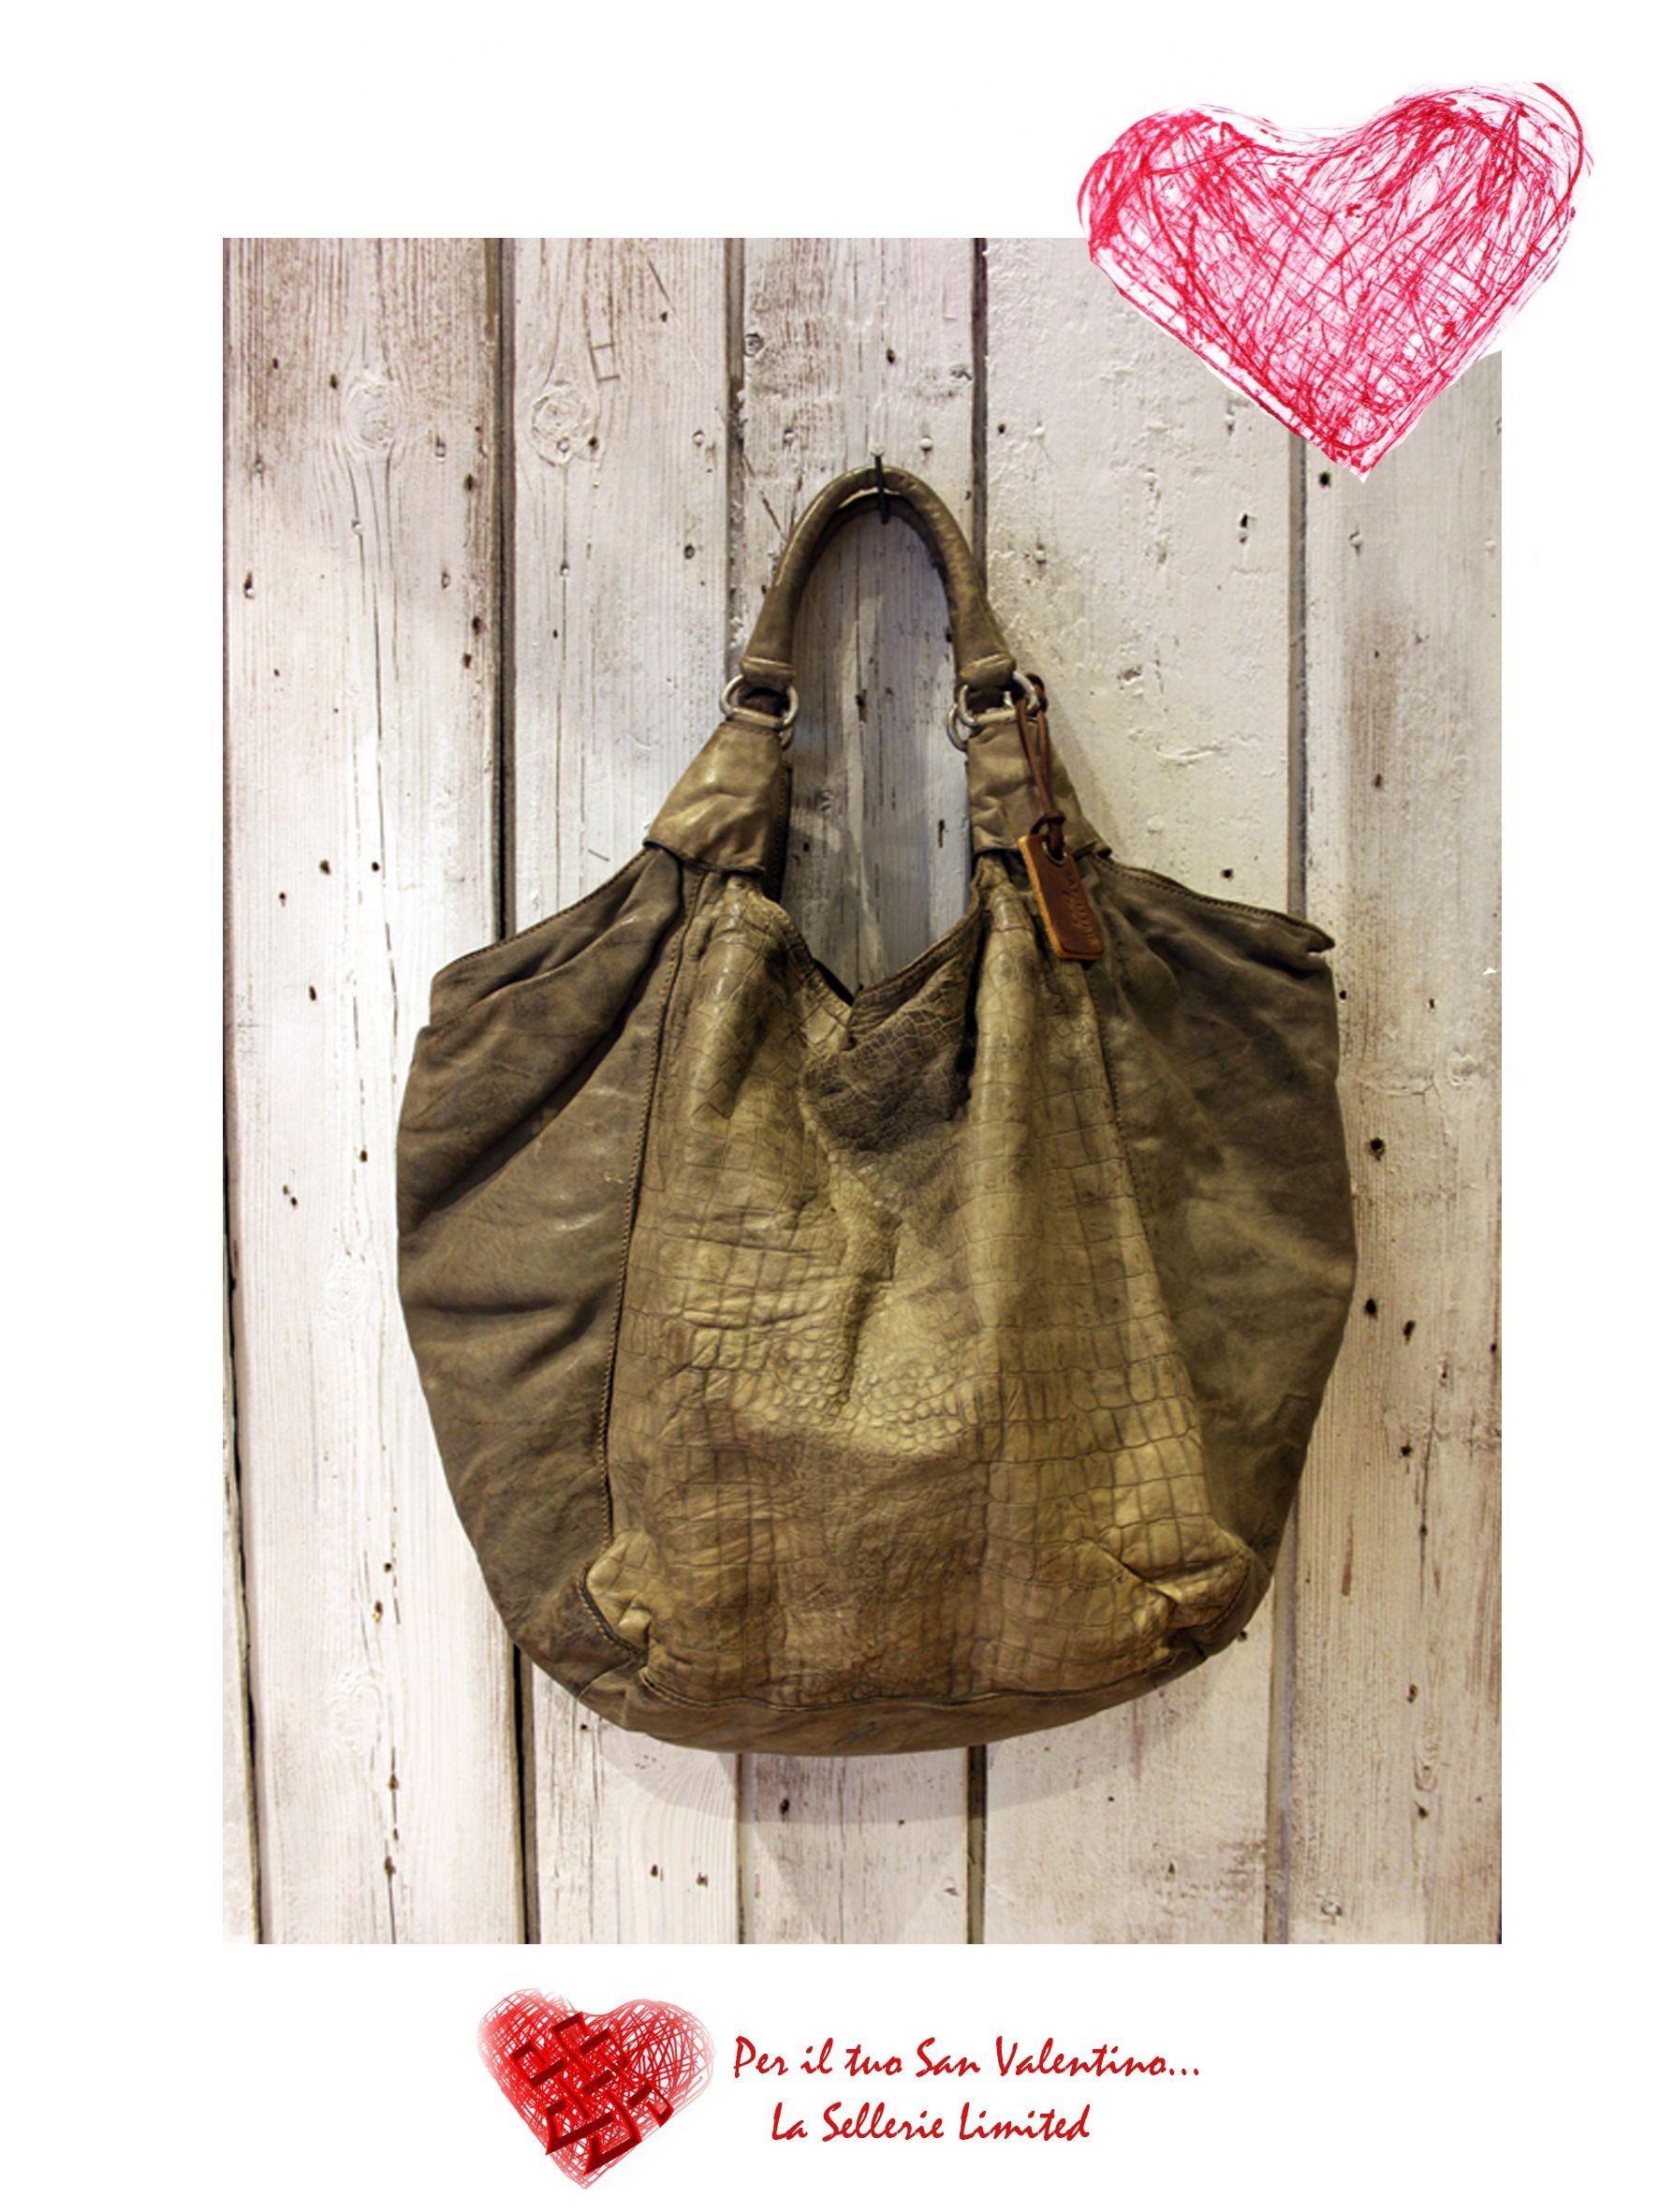 La Sellerie Limited Shop Online On Https Www Etsy Com It Shop Lasellerielimited Ref Hdr Shop Menu Bags Italian Leather Tote Leather